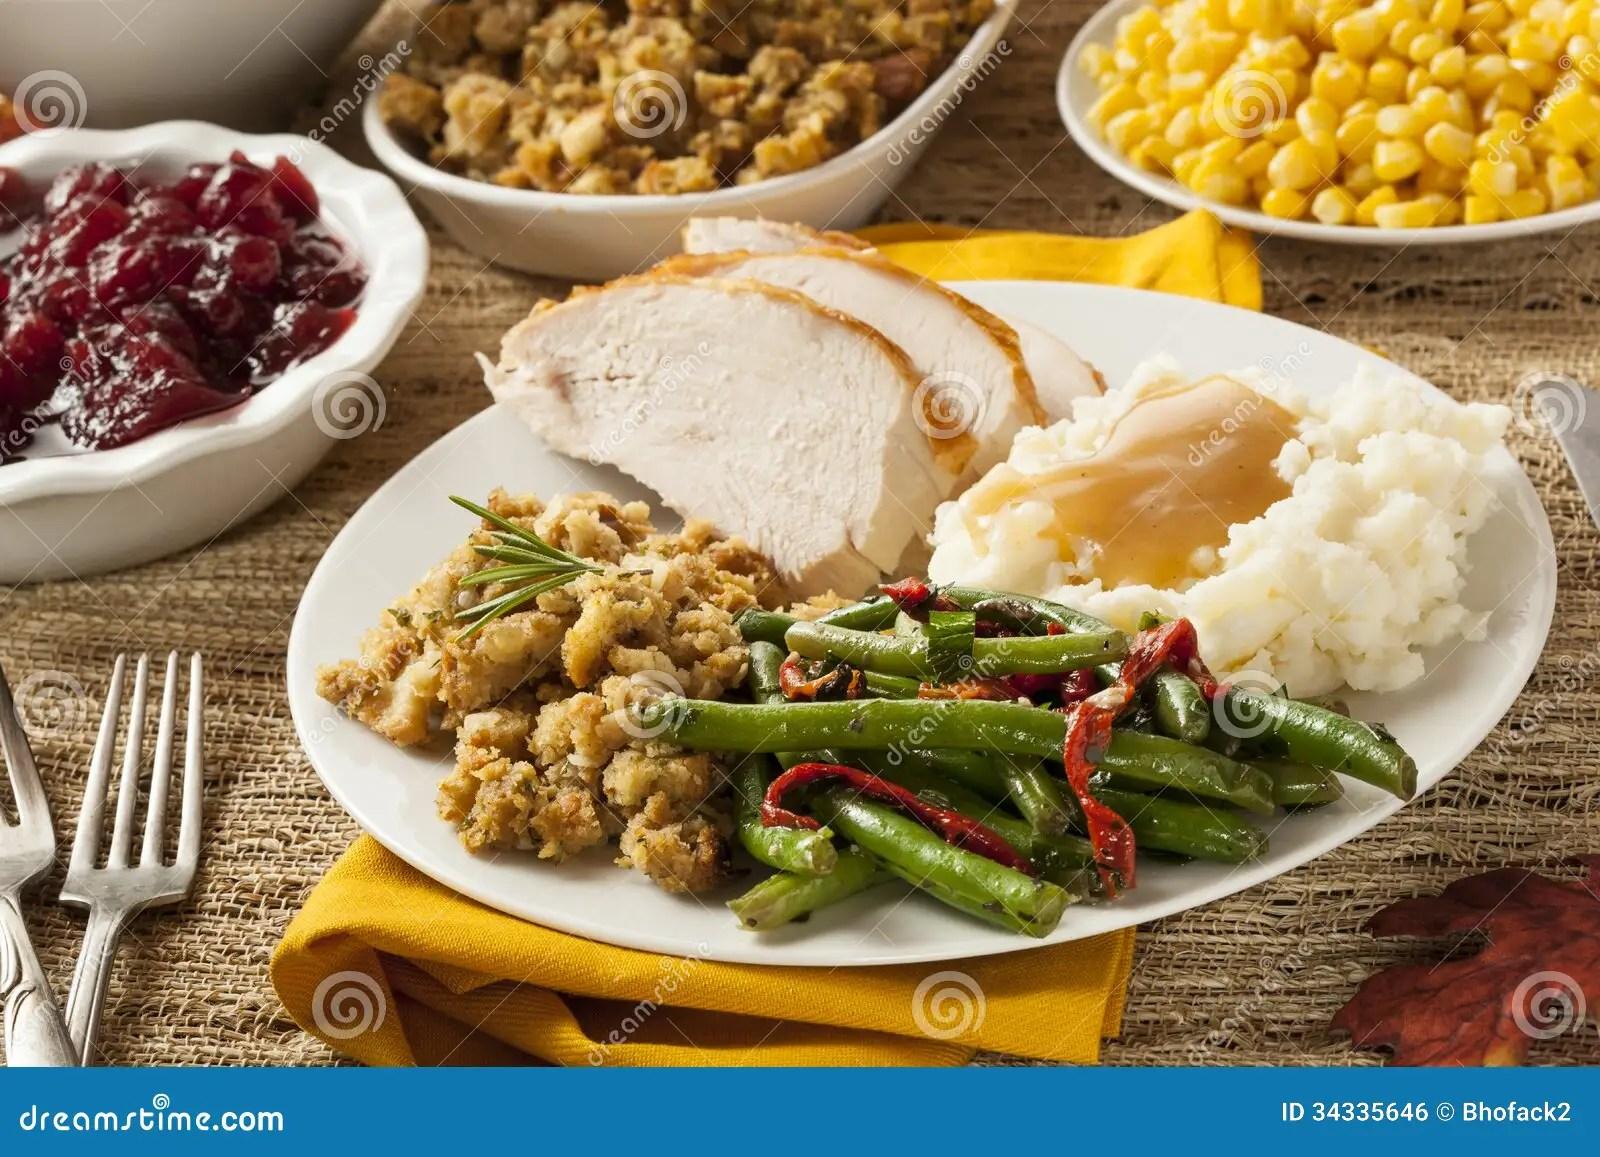 Homemade Turkey Thanksgiving Dinner Stock Photo  Image of